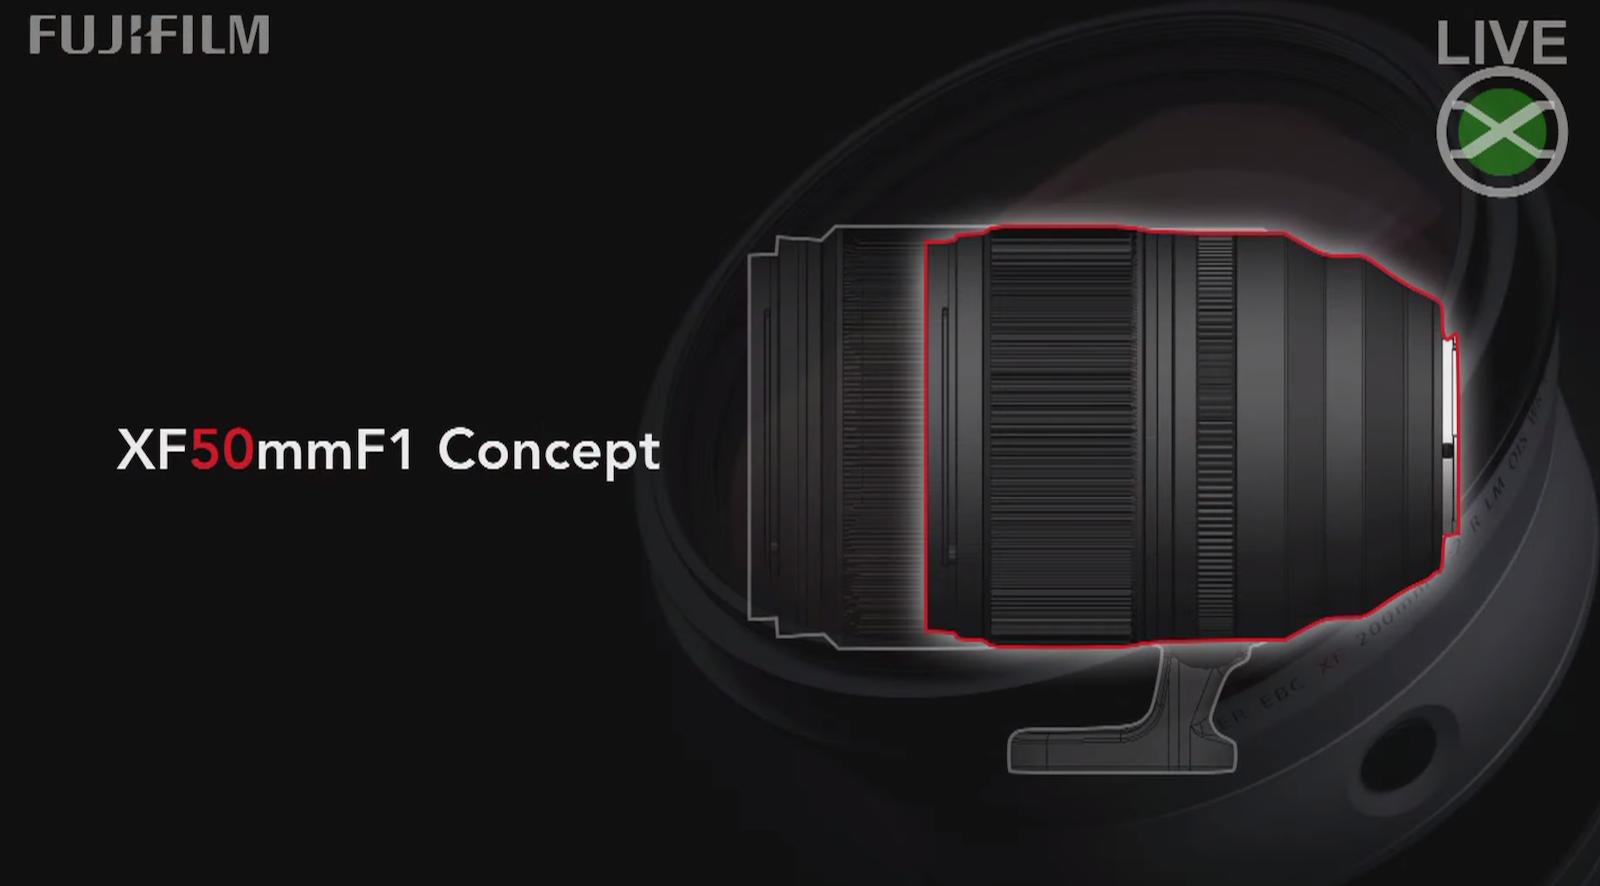 Fuji Scraps 33mm f/1.0 Lens, Will Make a 50mm f/1.0 Instead